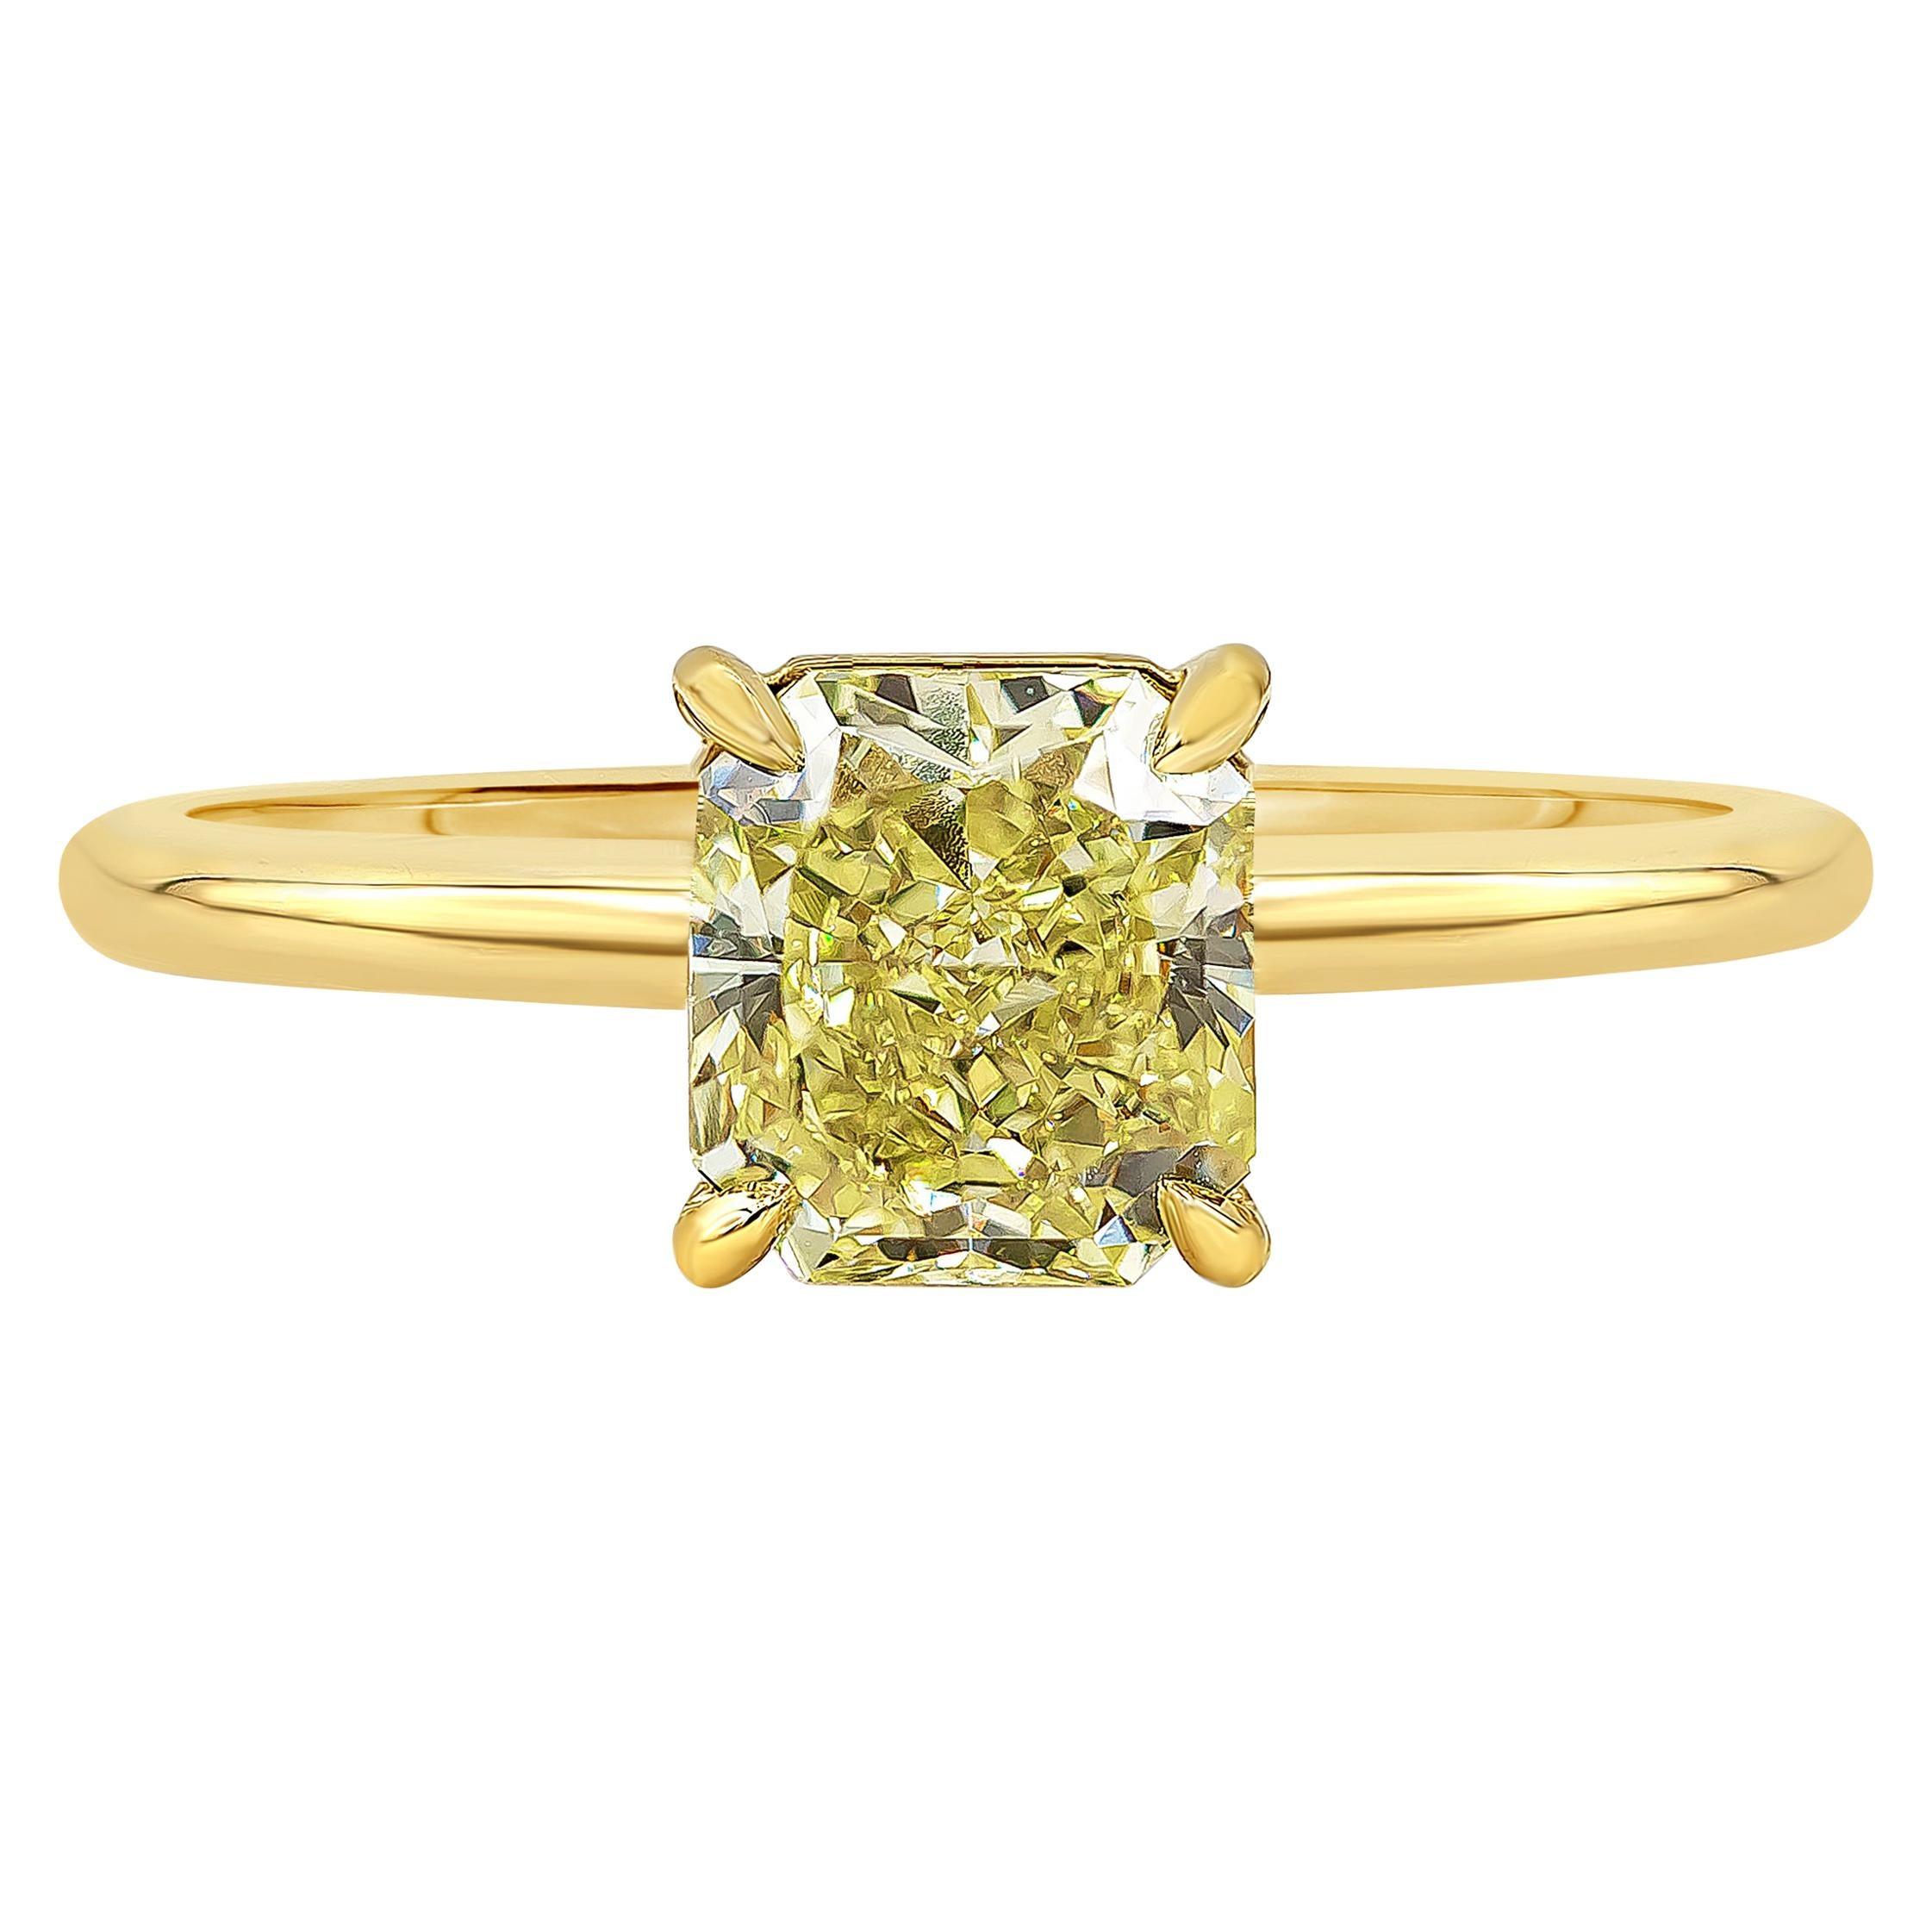 Roman Malakov GIA Certified Intense Yellow Diamond Solitaire Engagement Ring